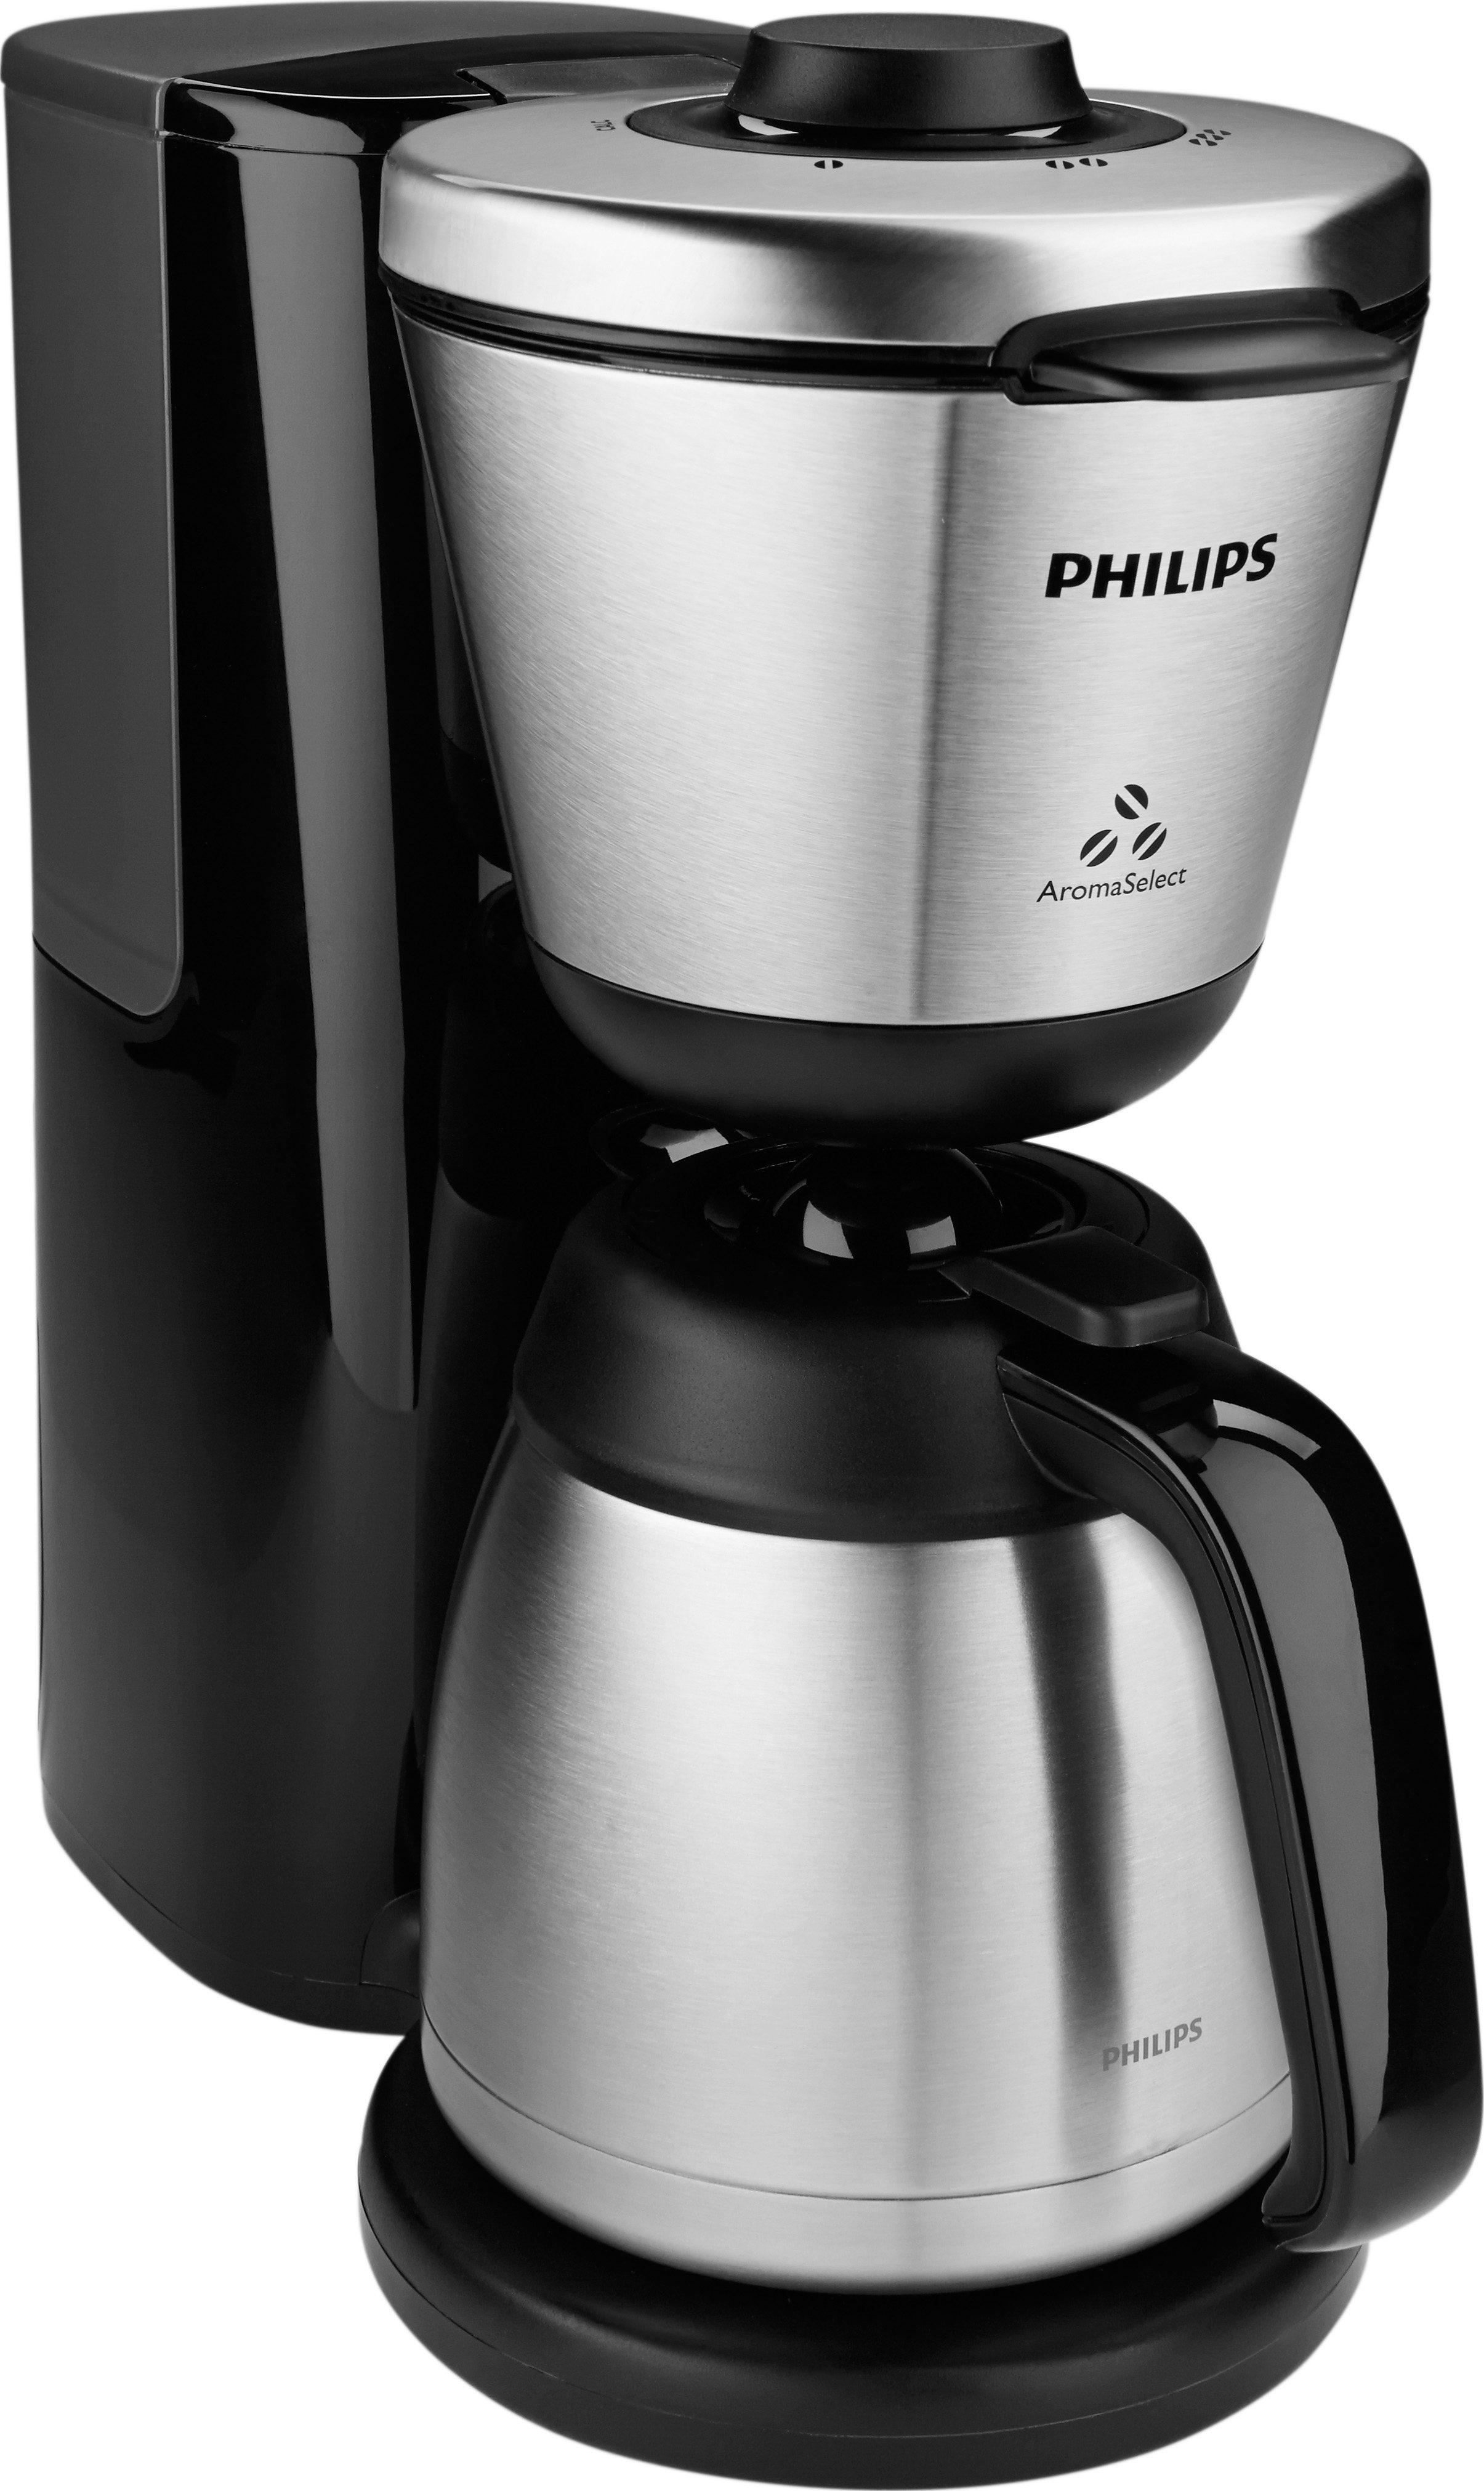 Philips Kaffeemaschine HD7697/90, Intense AromaSelect mit Thermokanne, schwarz